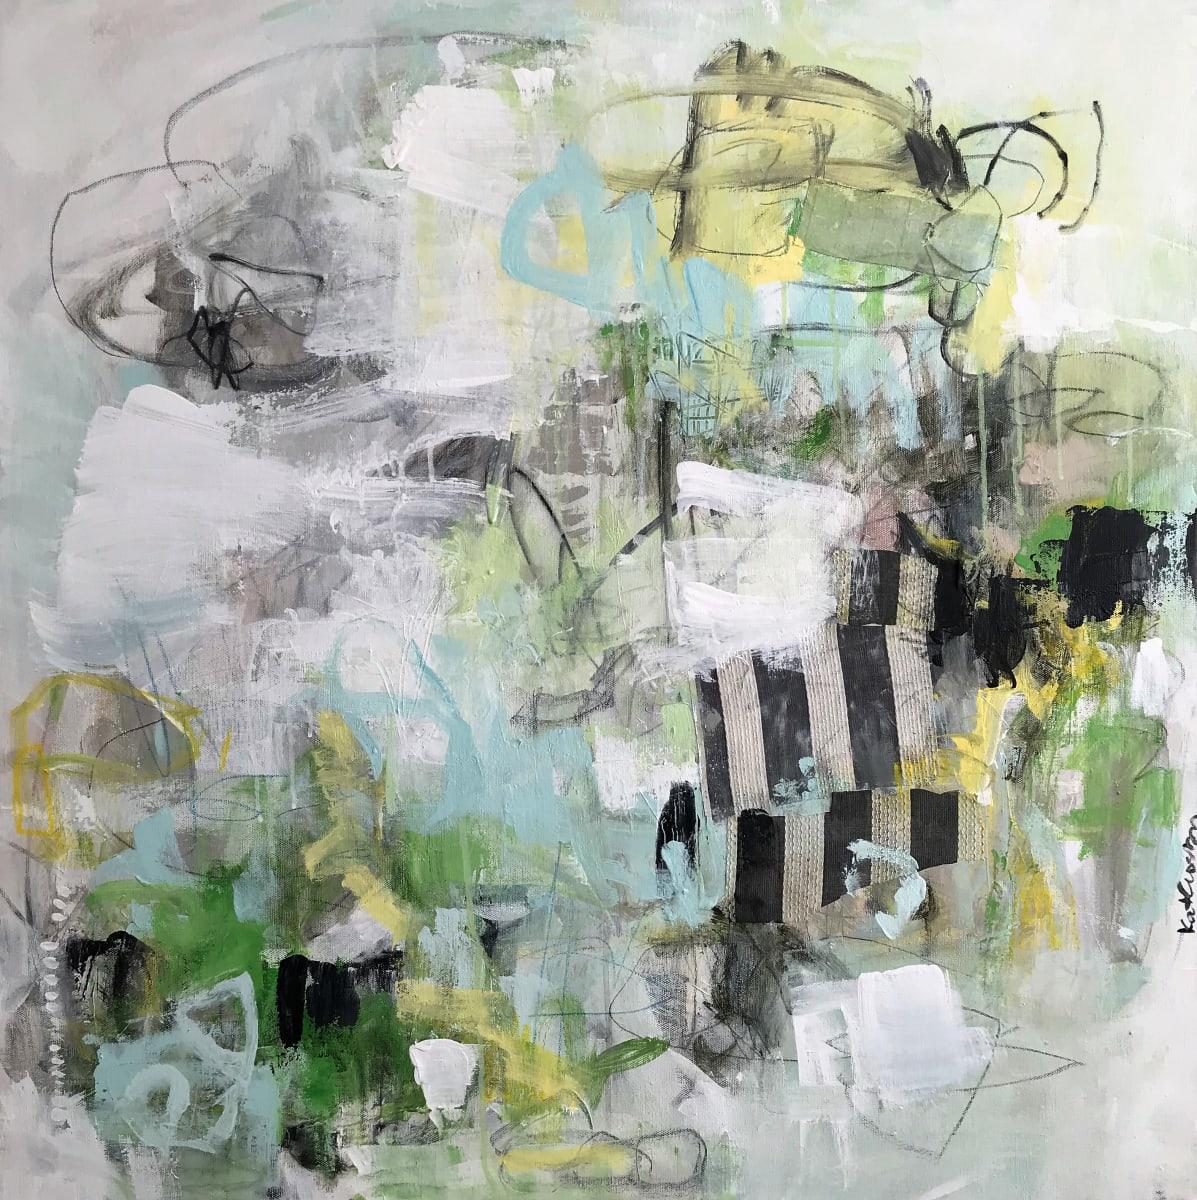 Down the Rabbit Hole by Kathryn Crosby